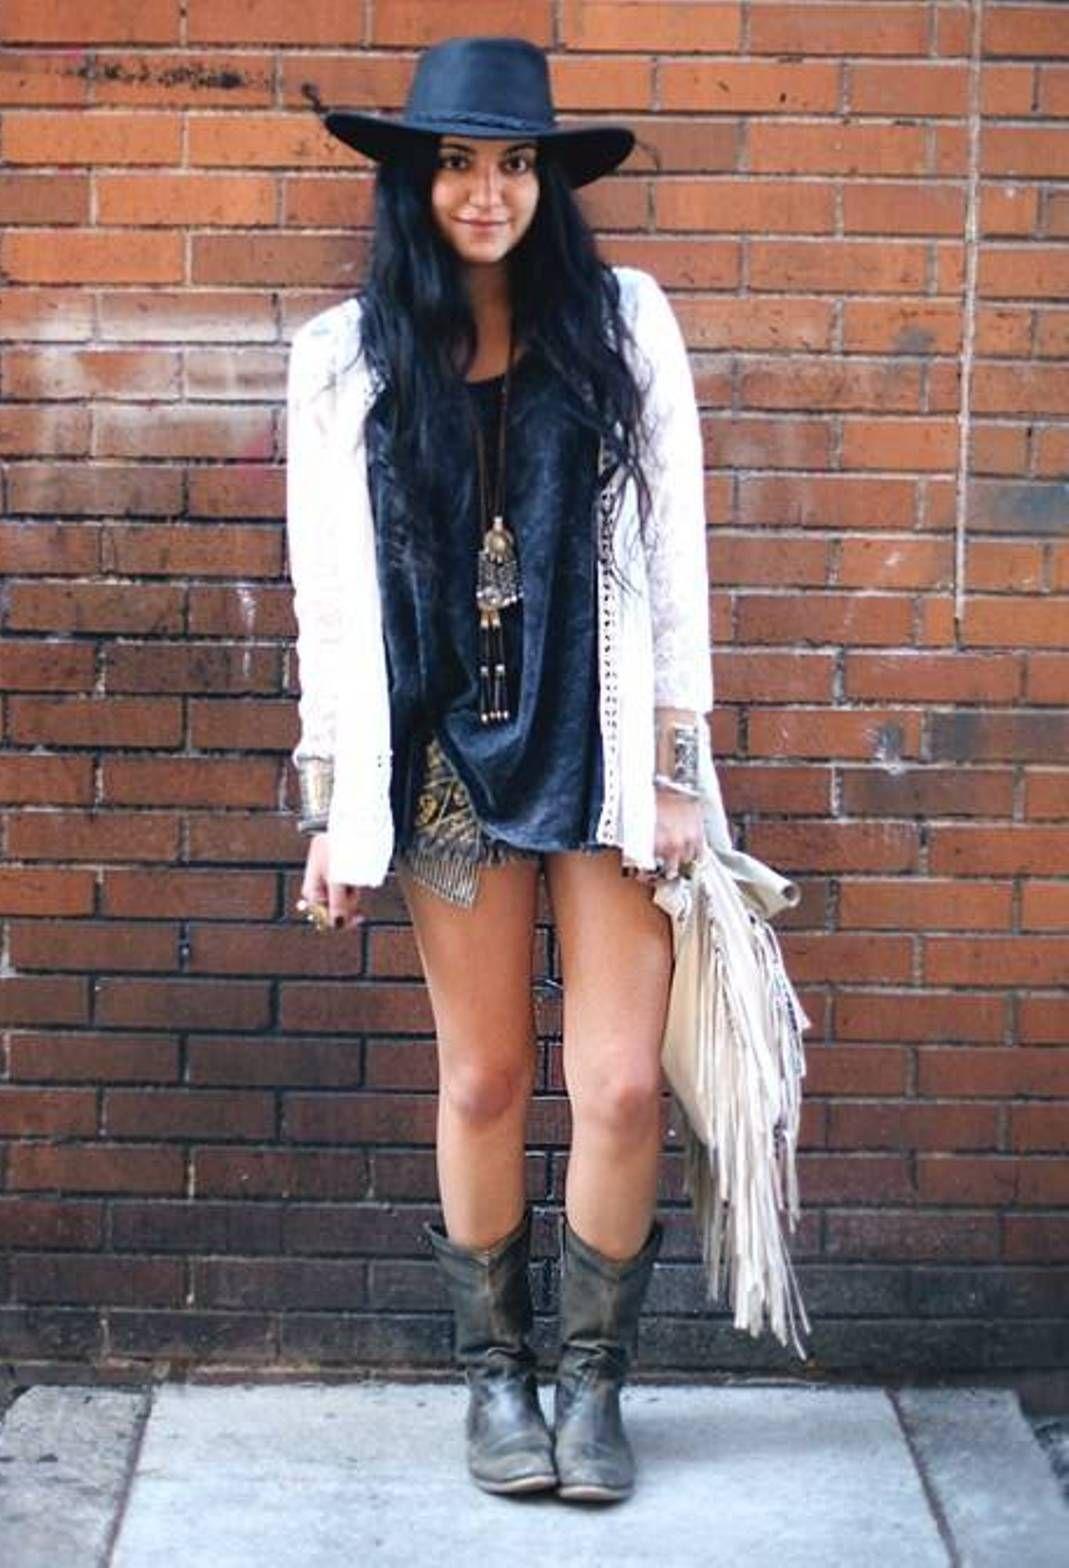 17 Best images about ÇİZMELİLER on Pinterest | White jeans, Boots ...